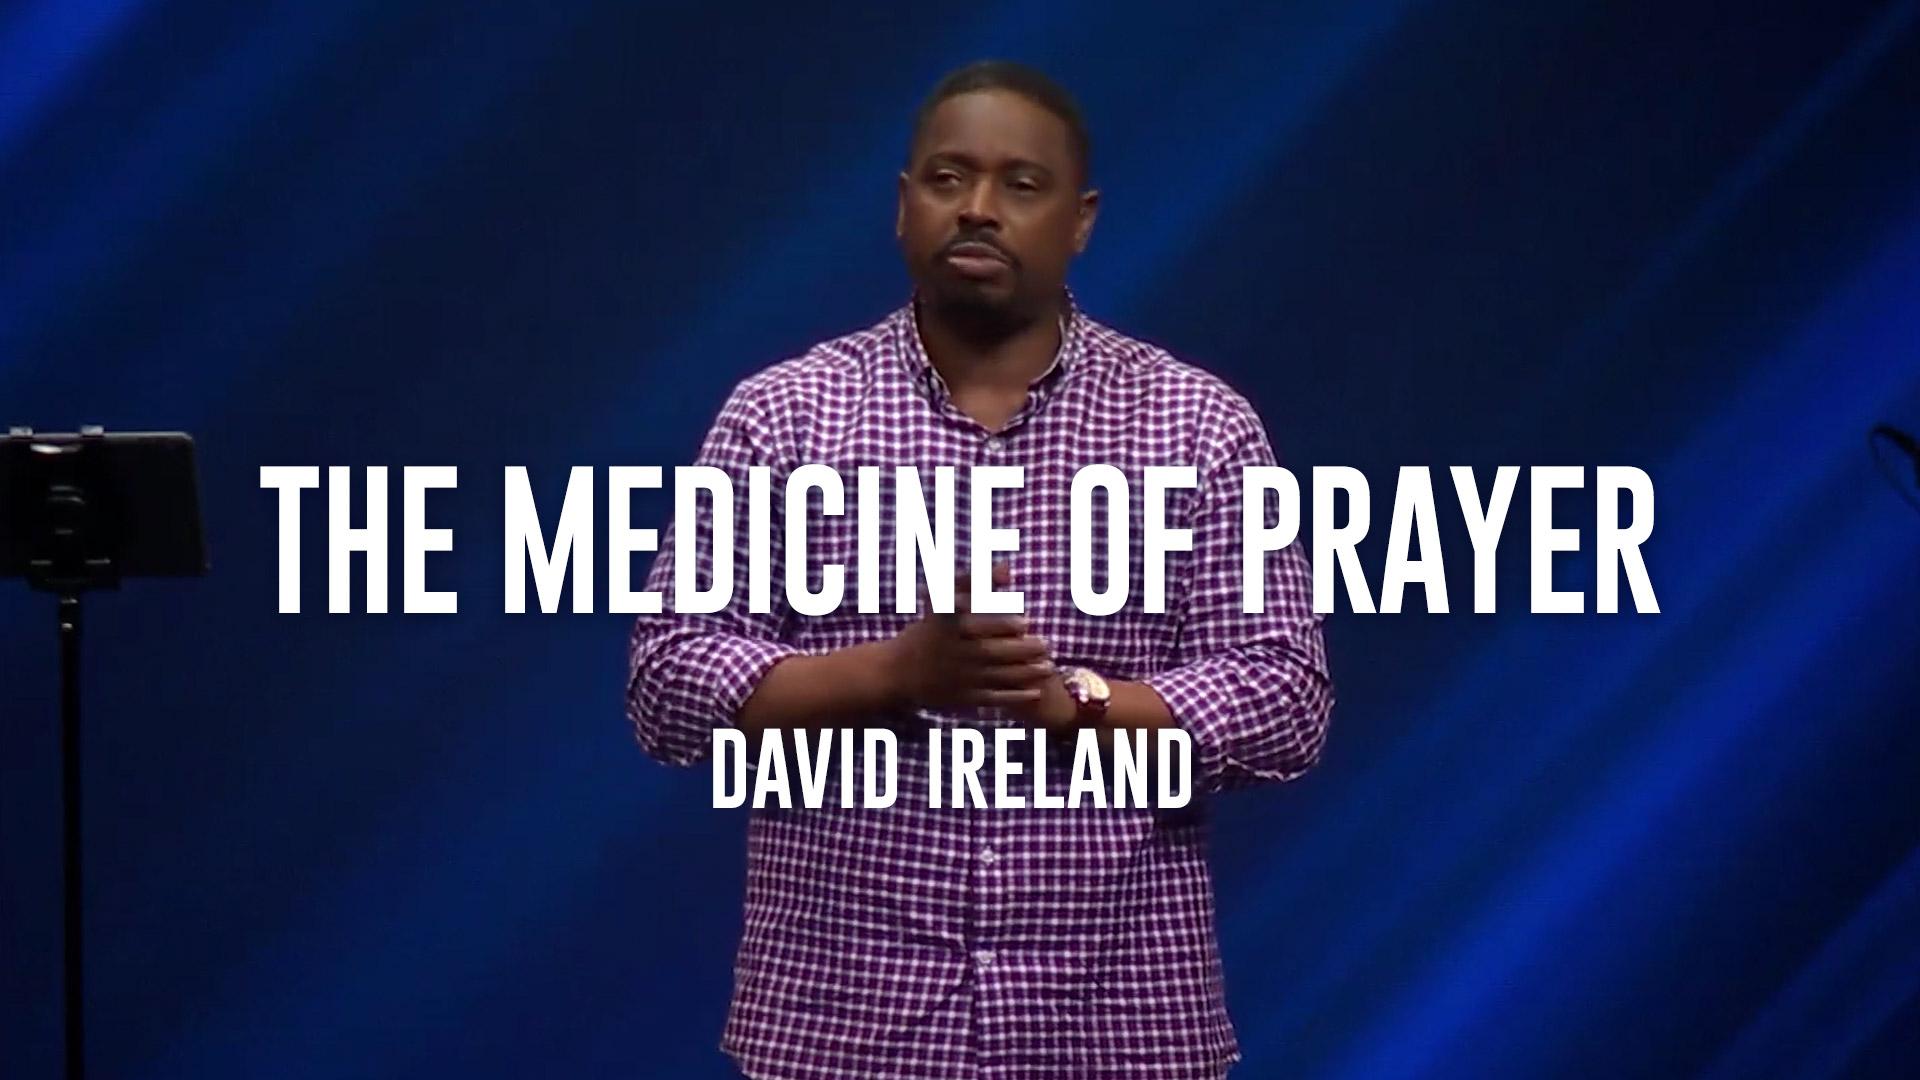 The Medicine of Prayer